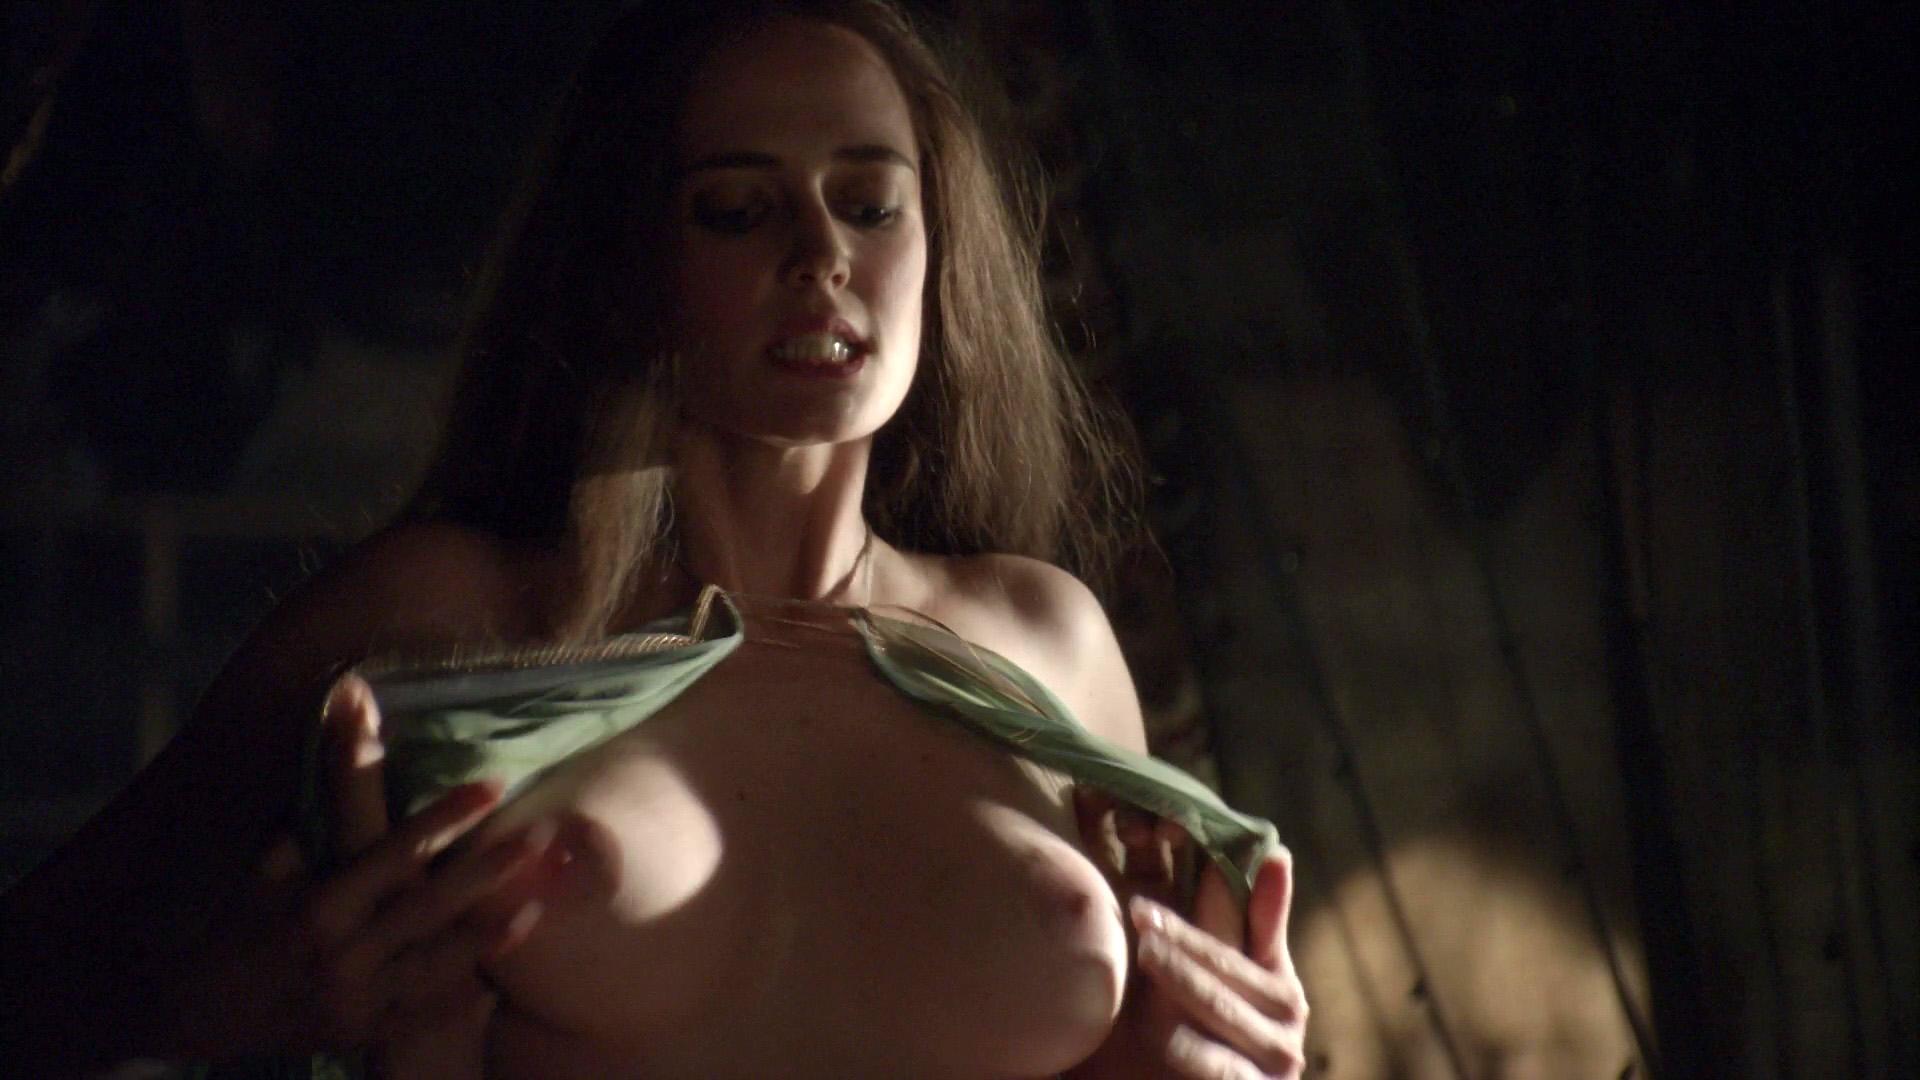 Film Porno Eva watch online - eva green – camelot s01 (2011) hd 1080p